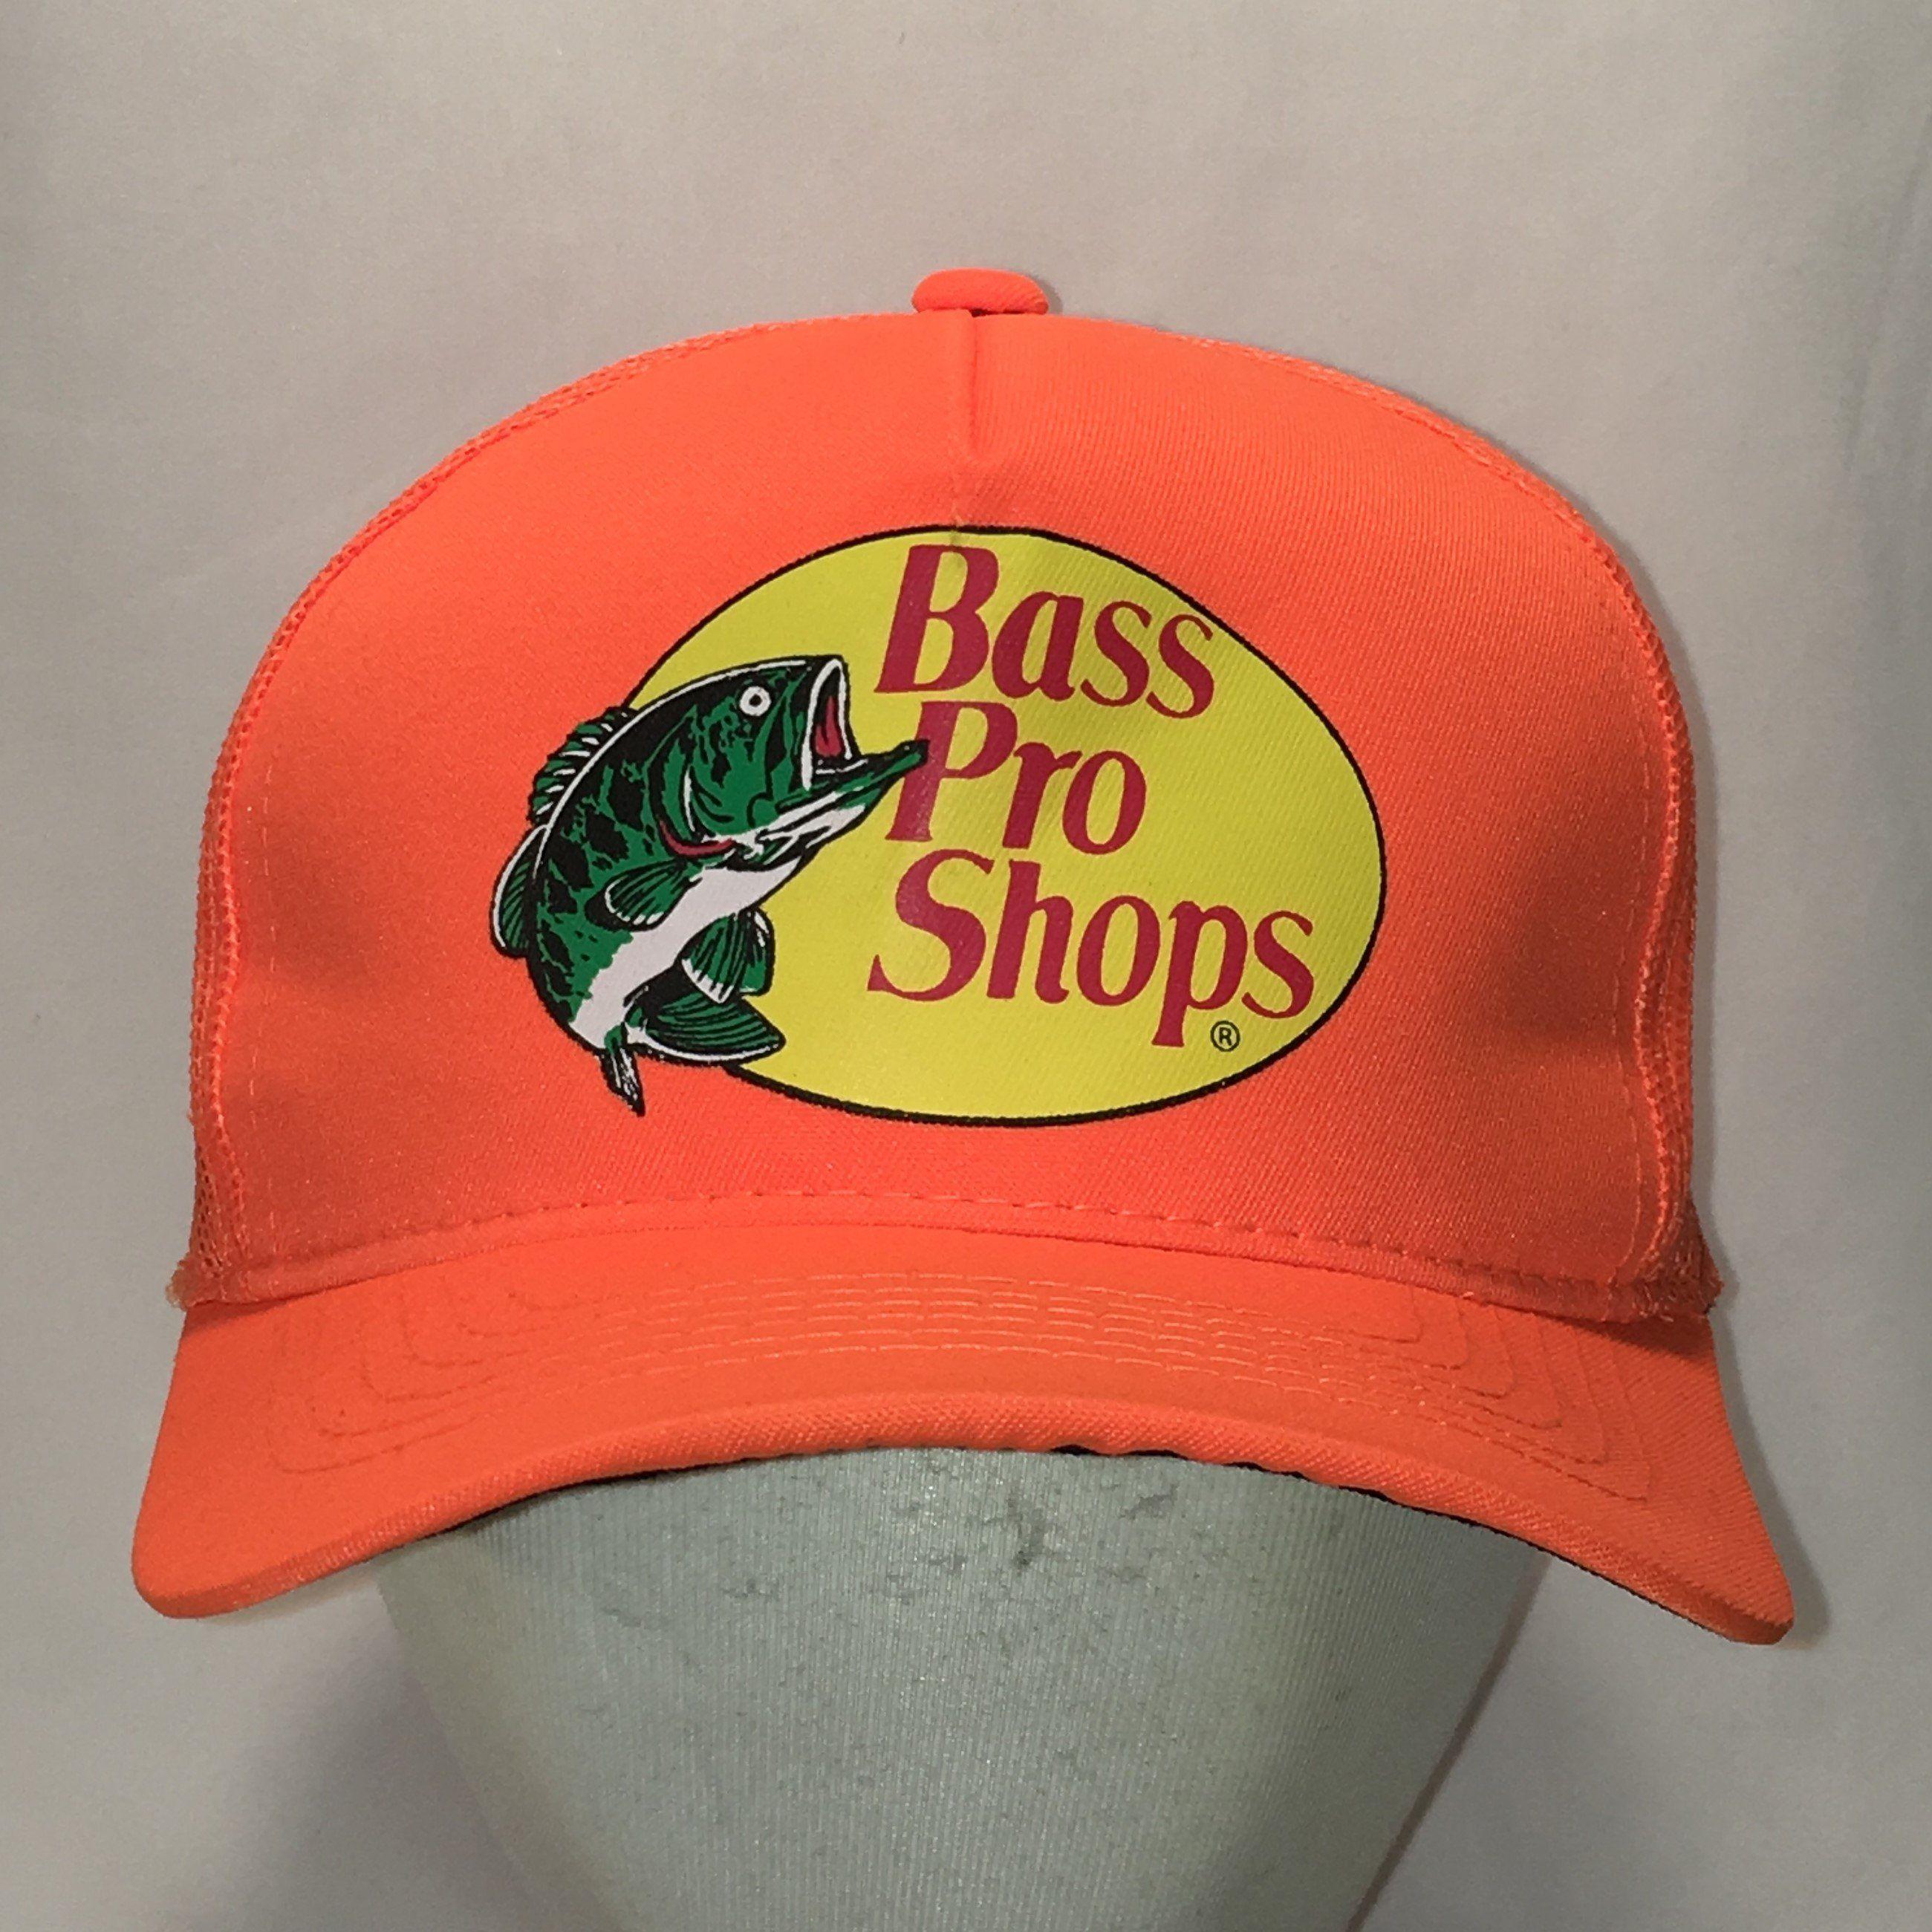 Vintage Snapback Fishing Hat Bass Pro Shops Baseball Cap Dad Etsy Fishing Hat Bass Pro Shop Hat Bass Pro Shops